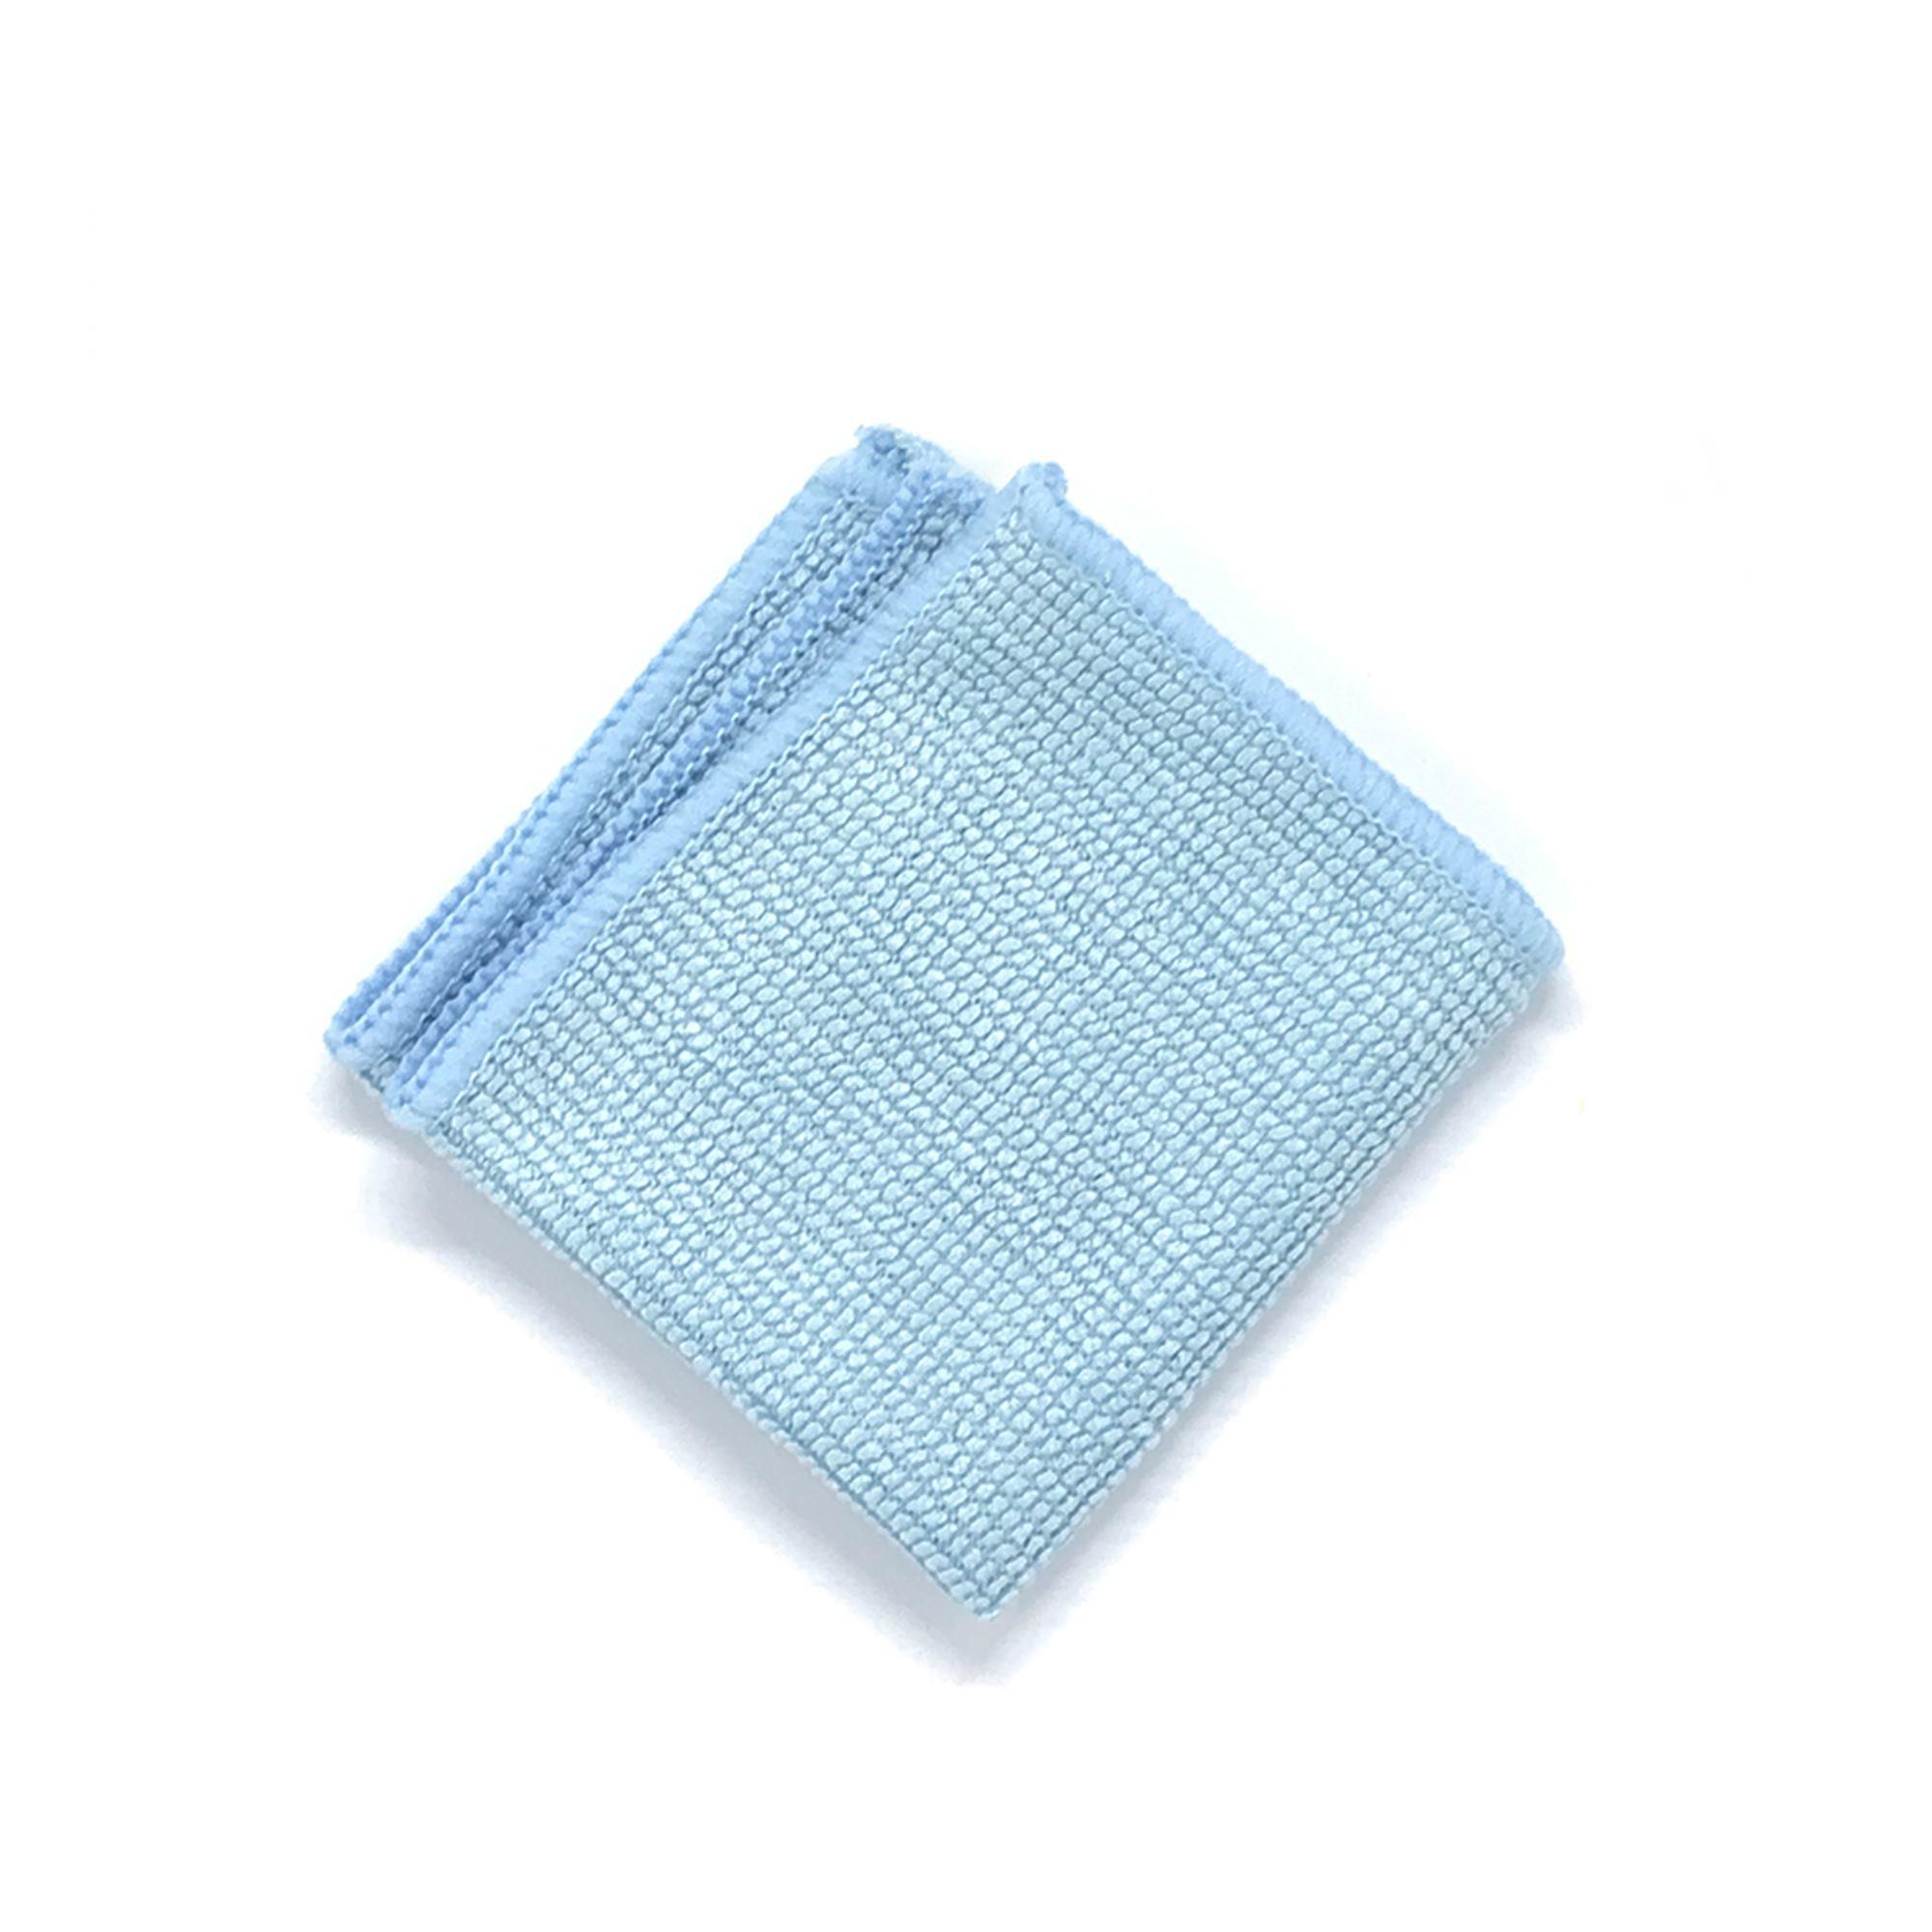 17F0511 - Microfibra Felpuda 15x15 Azul - Contém 1 Peça